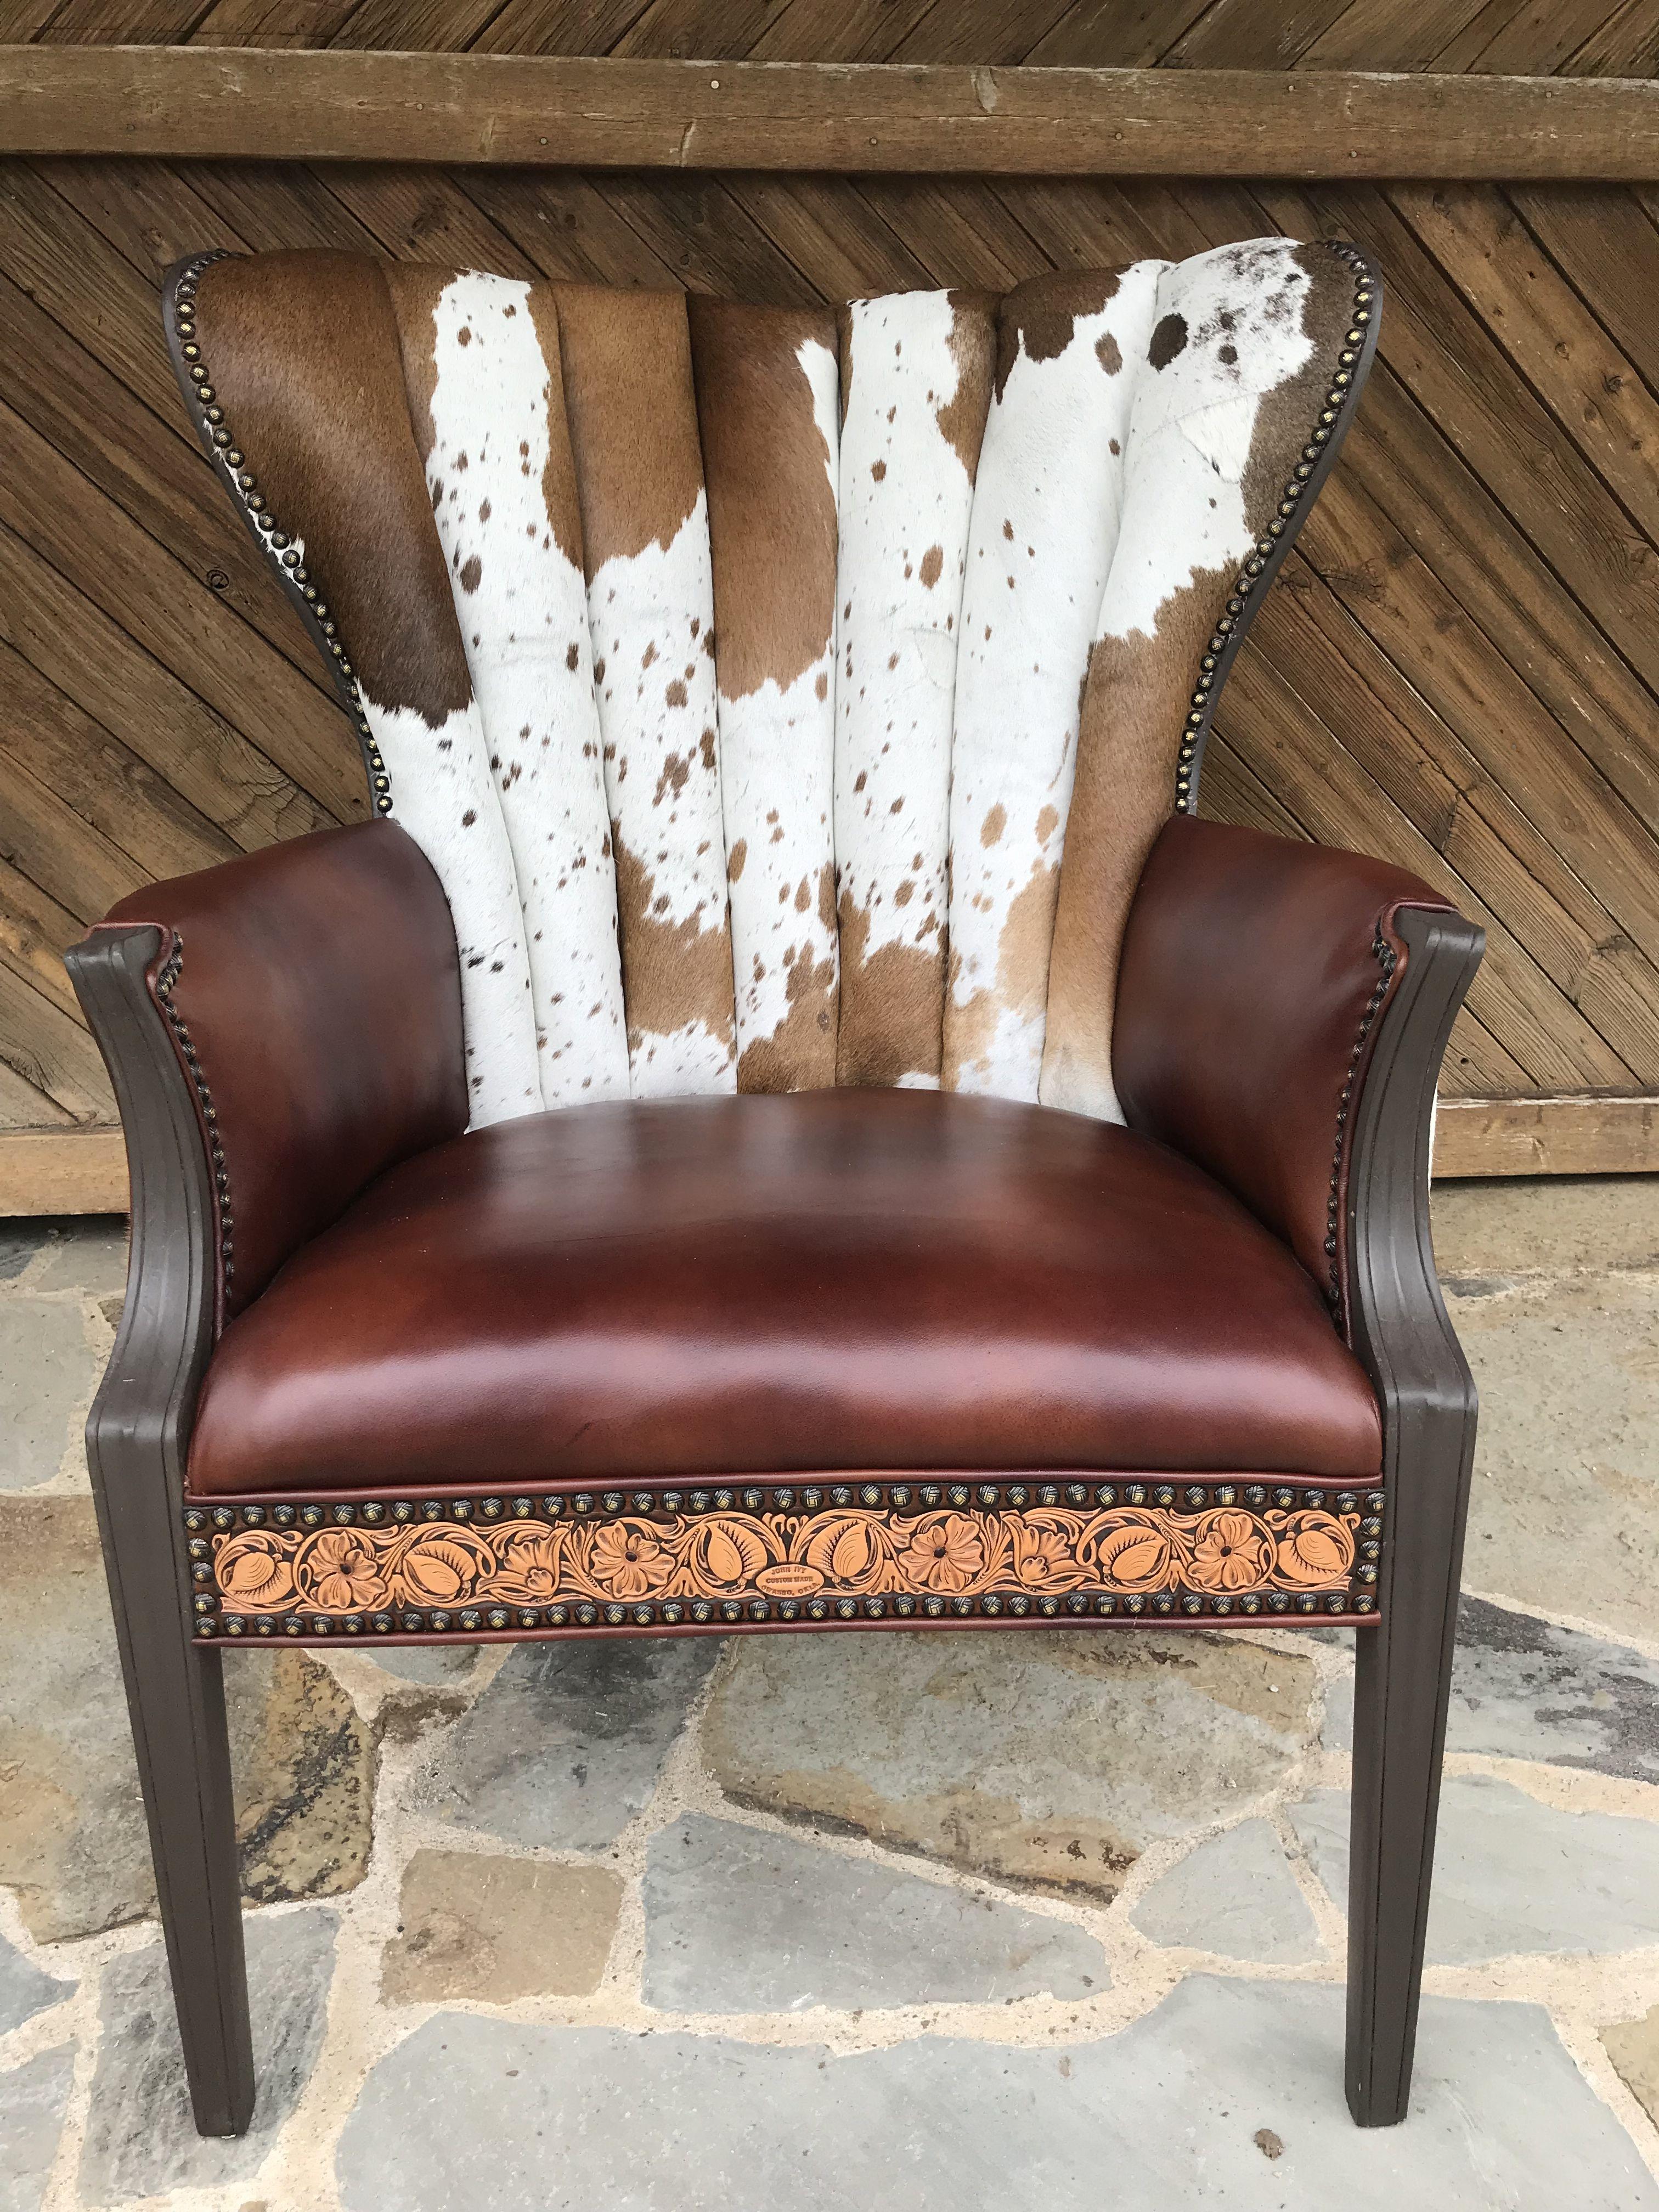 Cowhide chair cowhide chair chair wingback chair